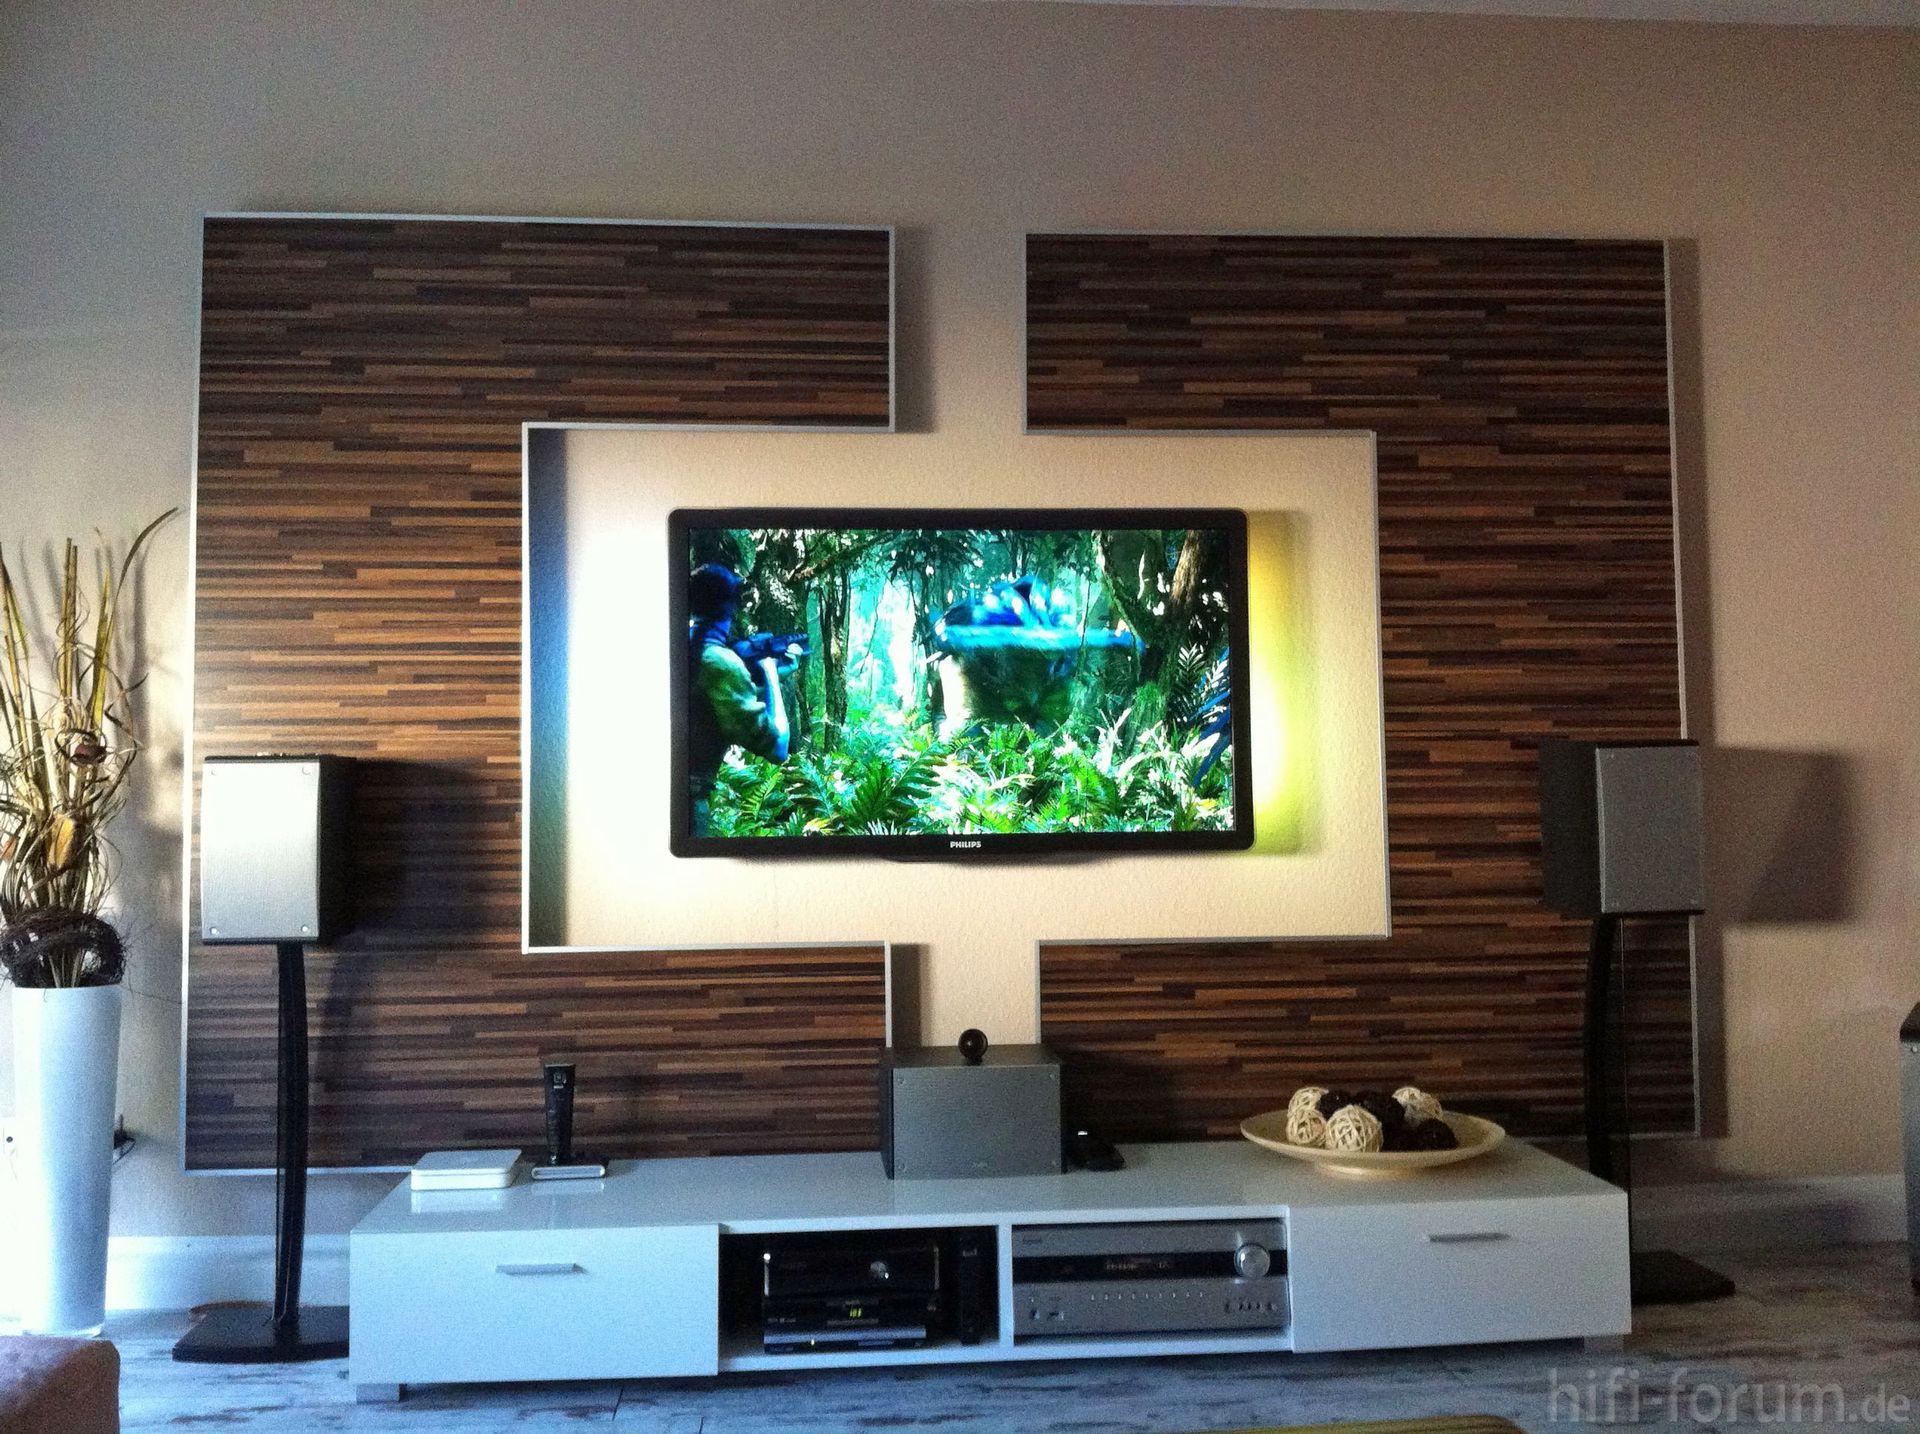 Tv wand selber bauen laminat  Die besten 25+ Tv wand trockenbau selber bauen Ideen auf Pinterest ...